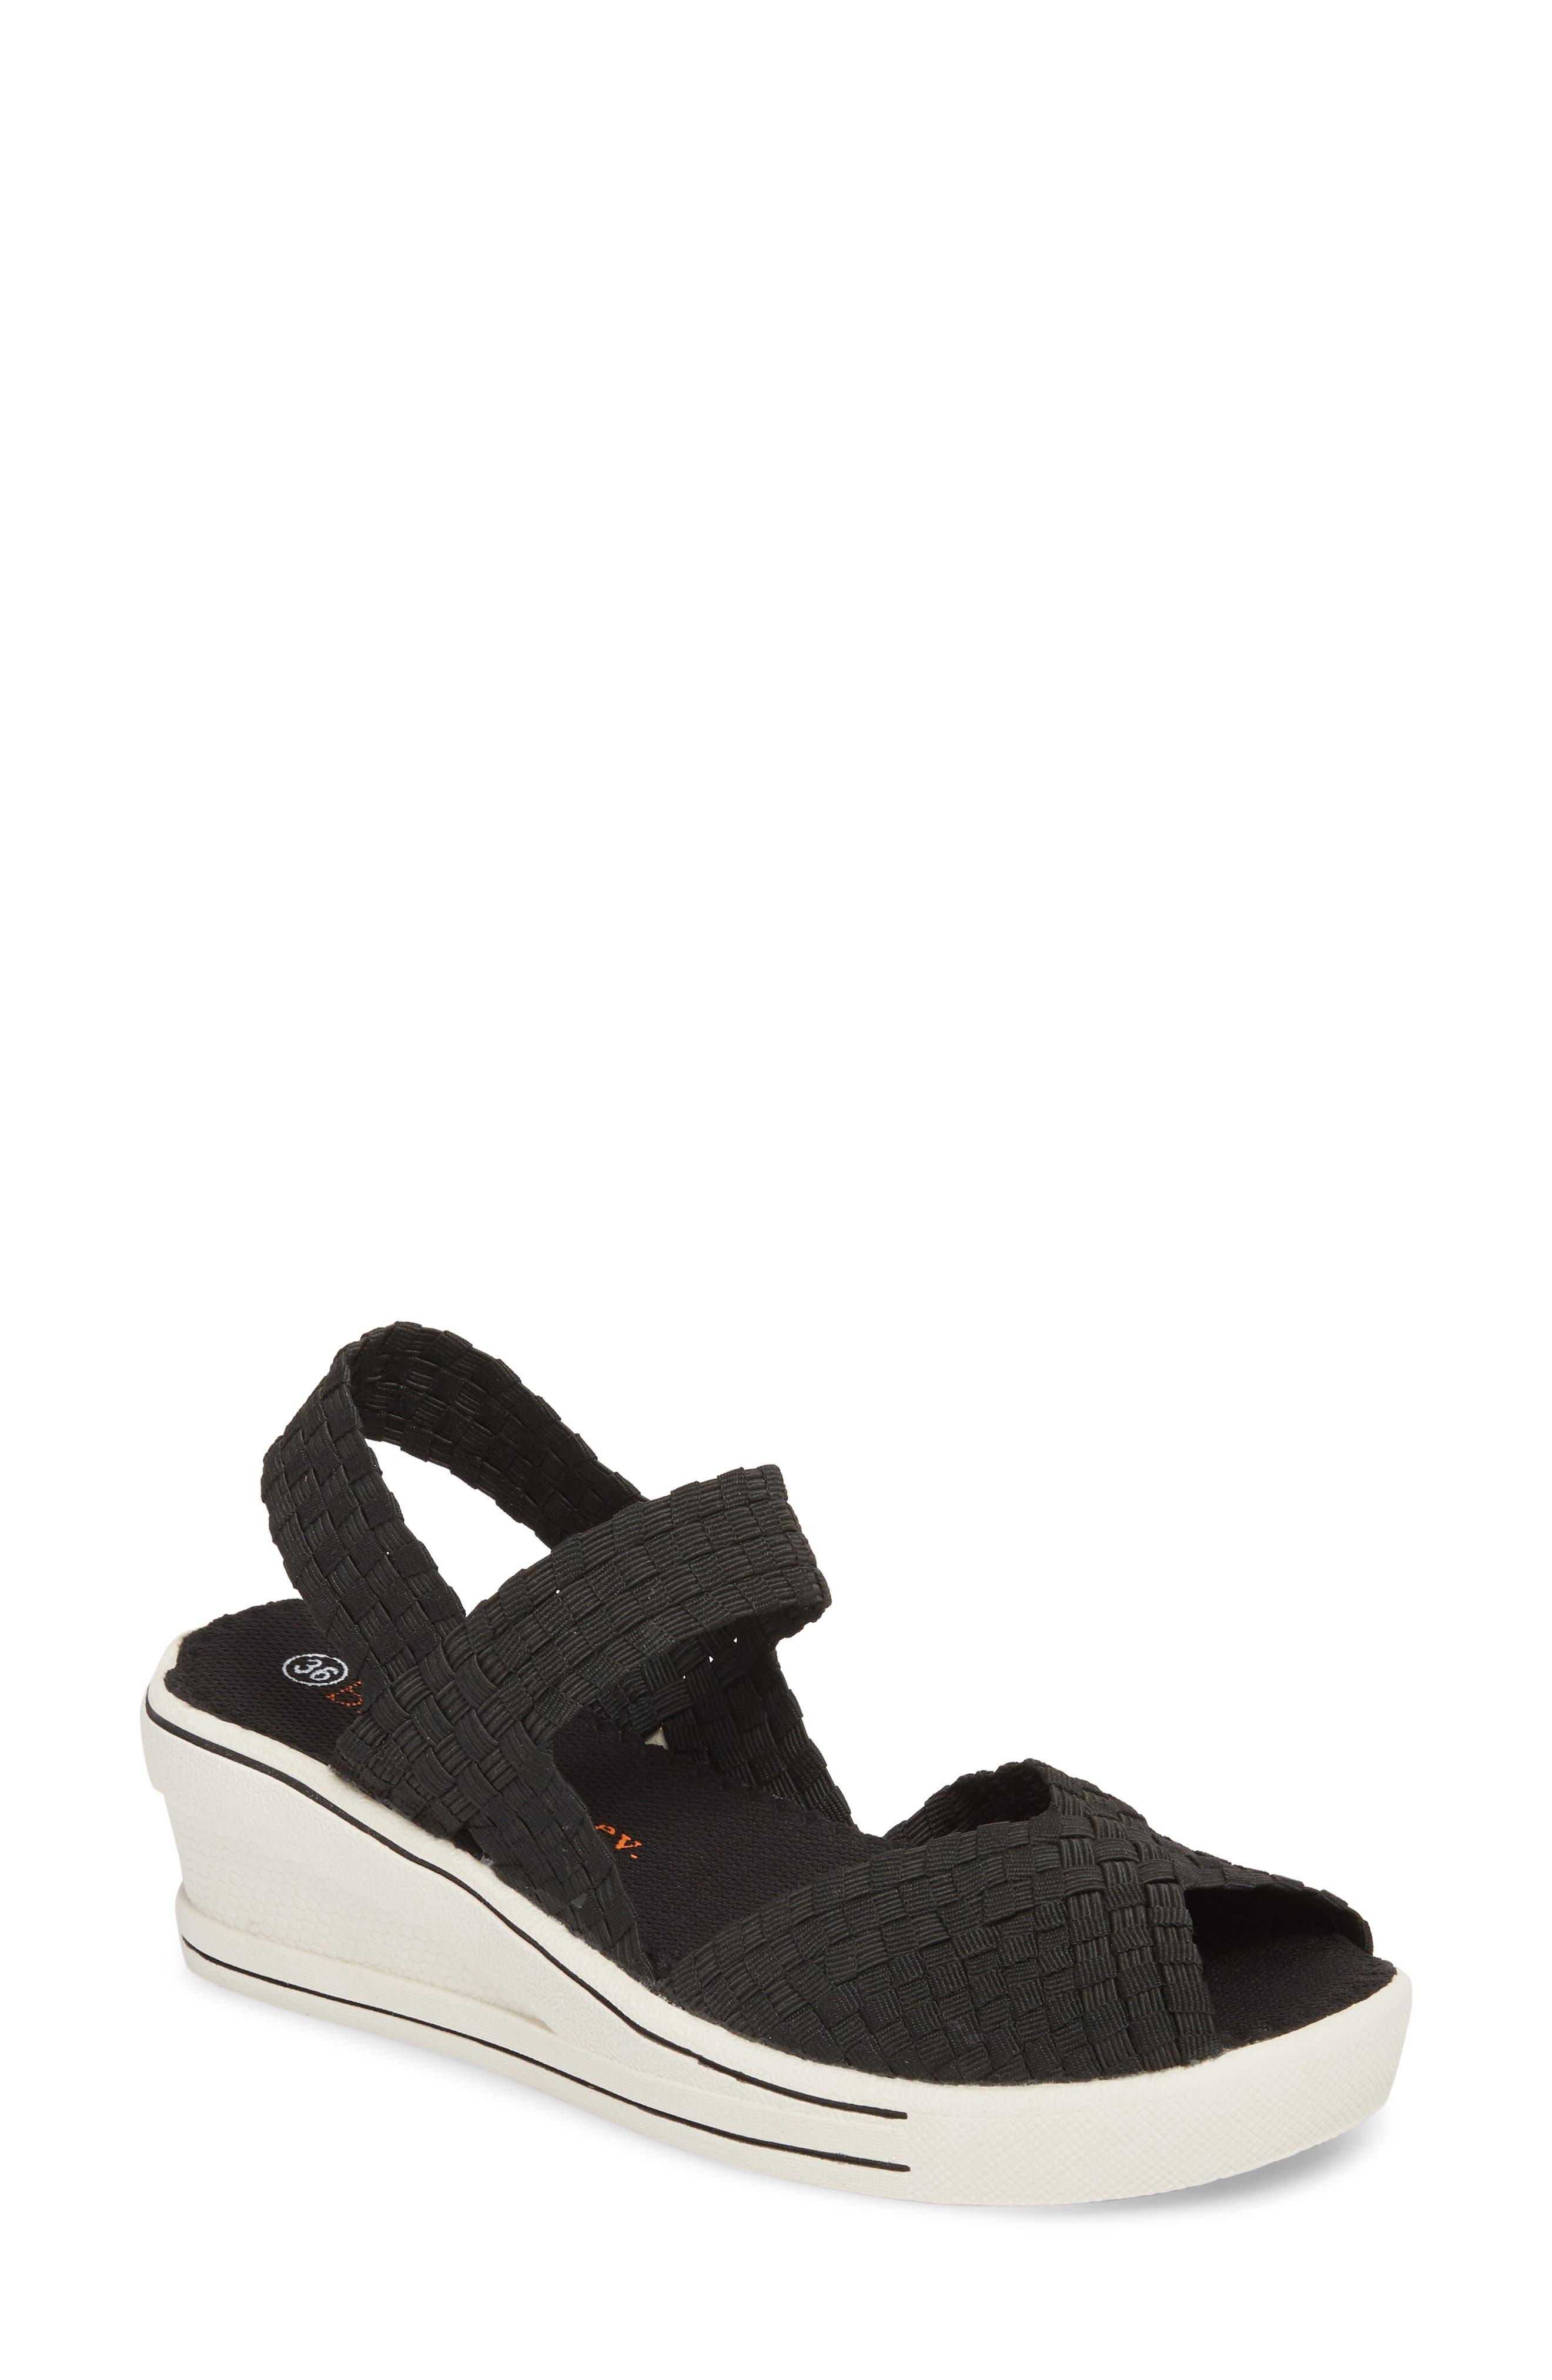 Lux Garden Sandal,                         Main,                         color, BLACK FABRIC